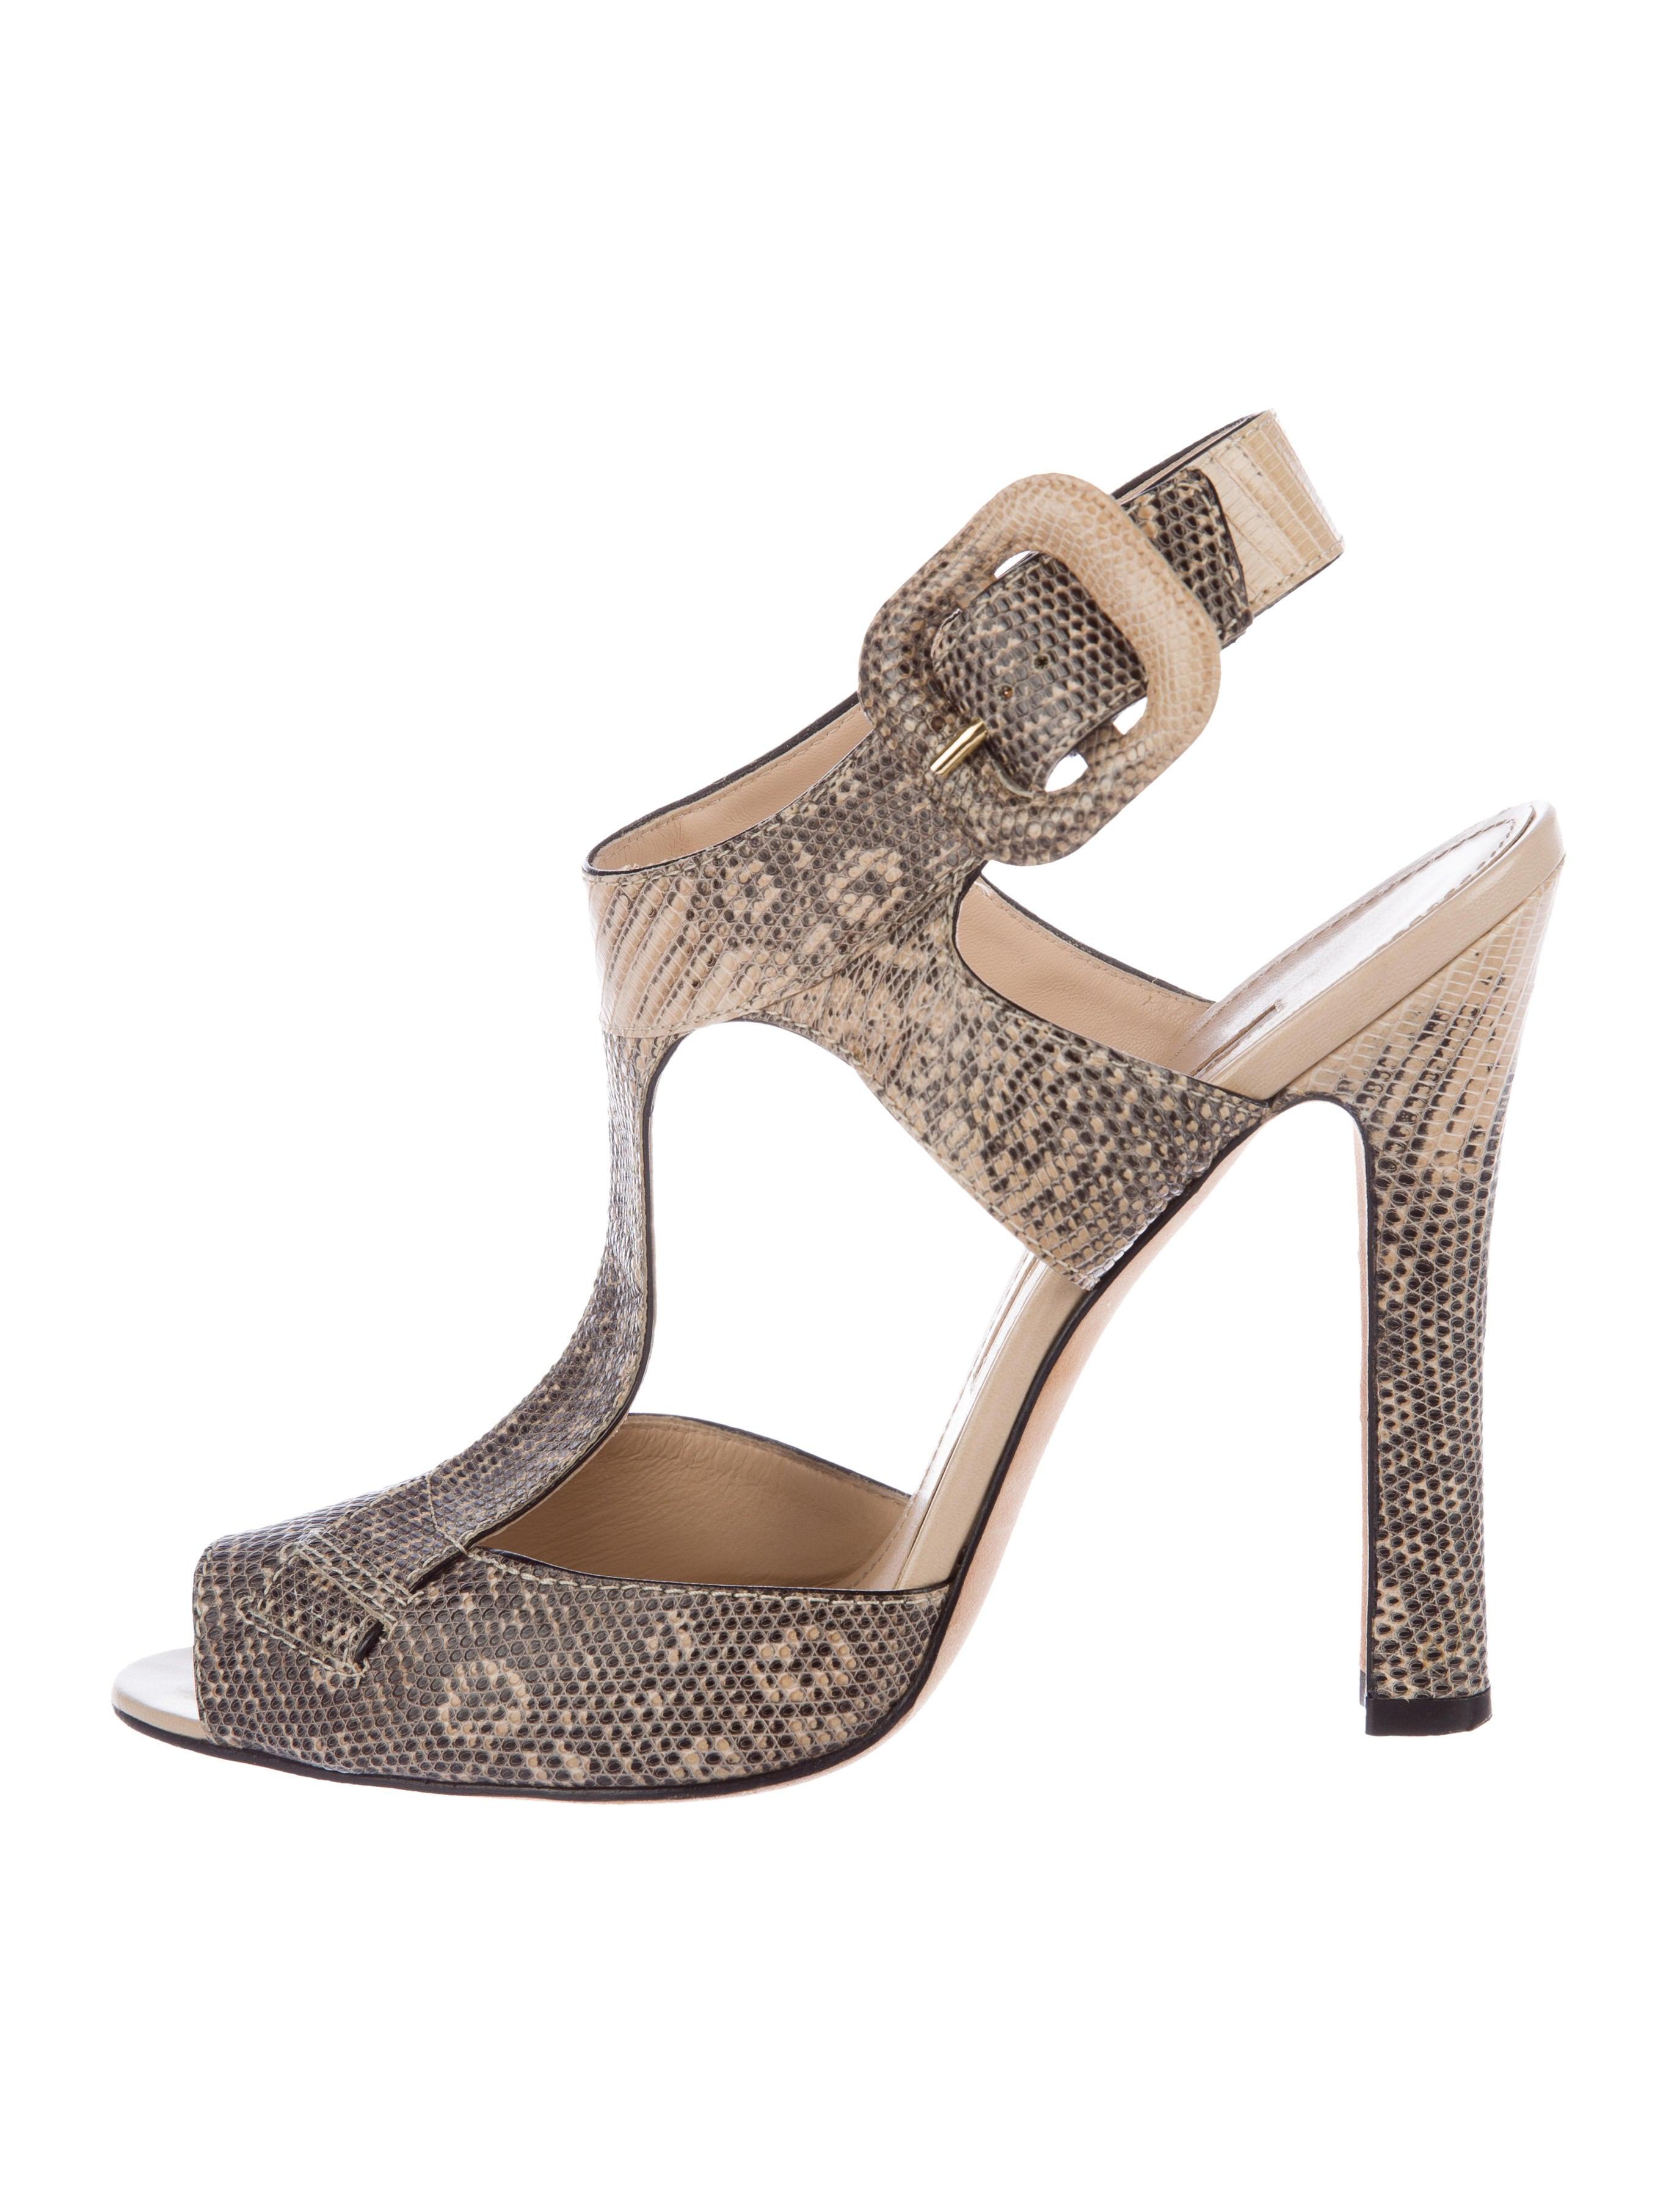 Manolo Blahnik Lizard T-Strap Sandals buy cheap prices dE6gL4